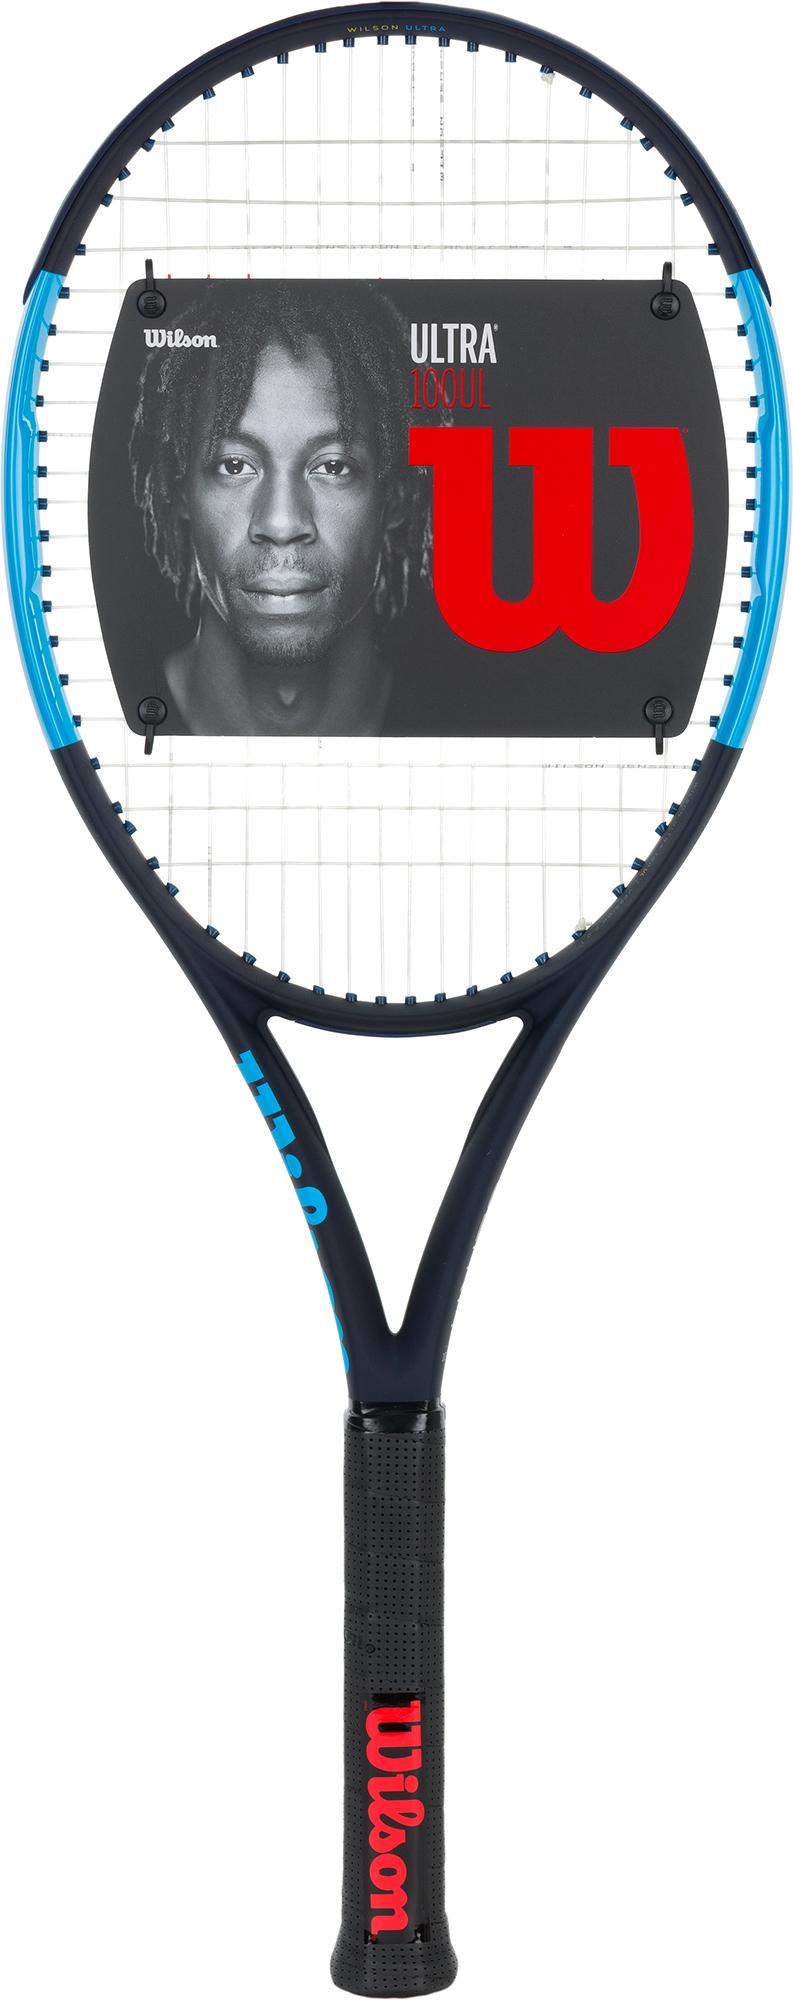 Wilson Ракетка для большого тенниса Wilson Ultra 100UL, размер 3 wilson набор мячей для большого тенниса wilson australian open 3 ball can размер без размера